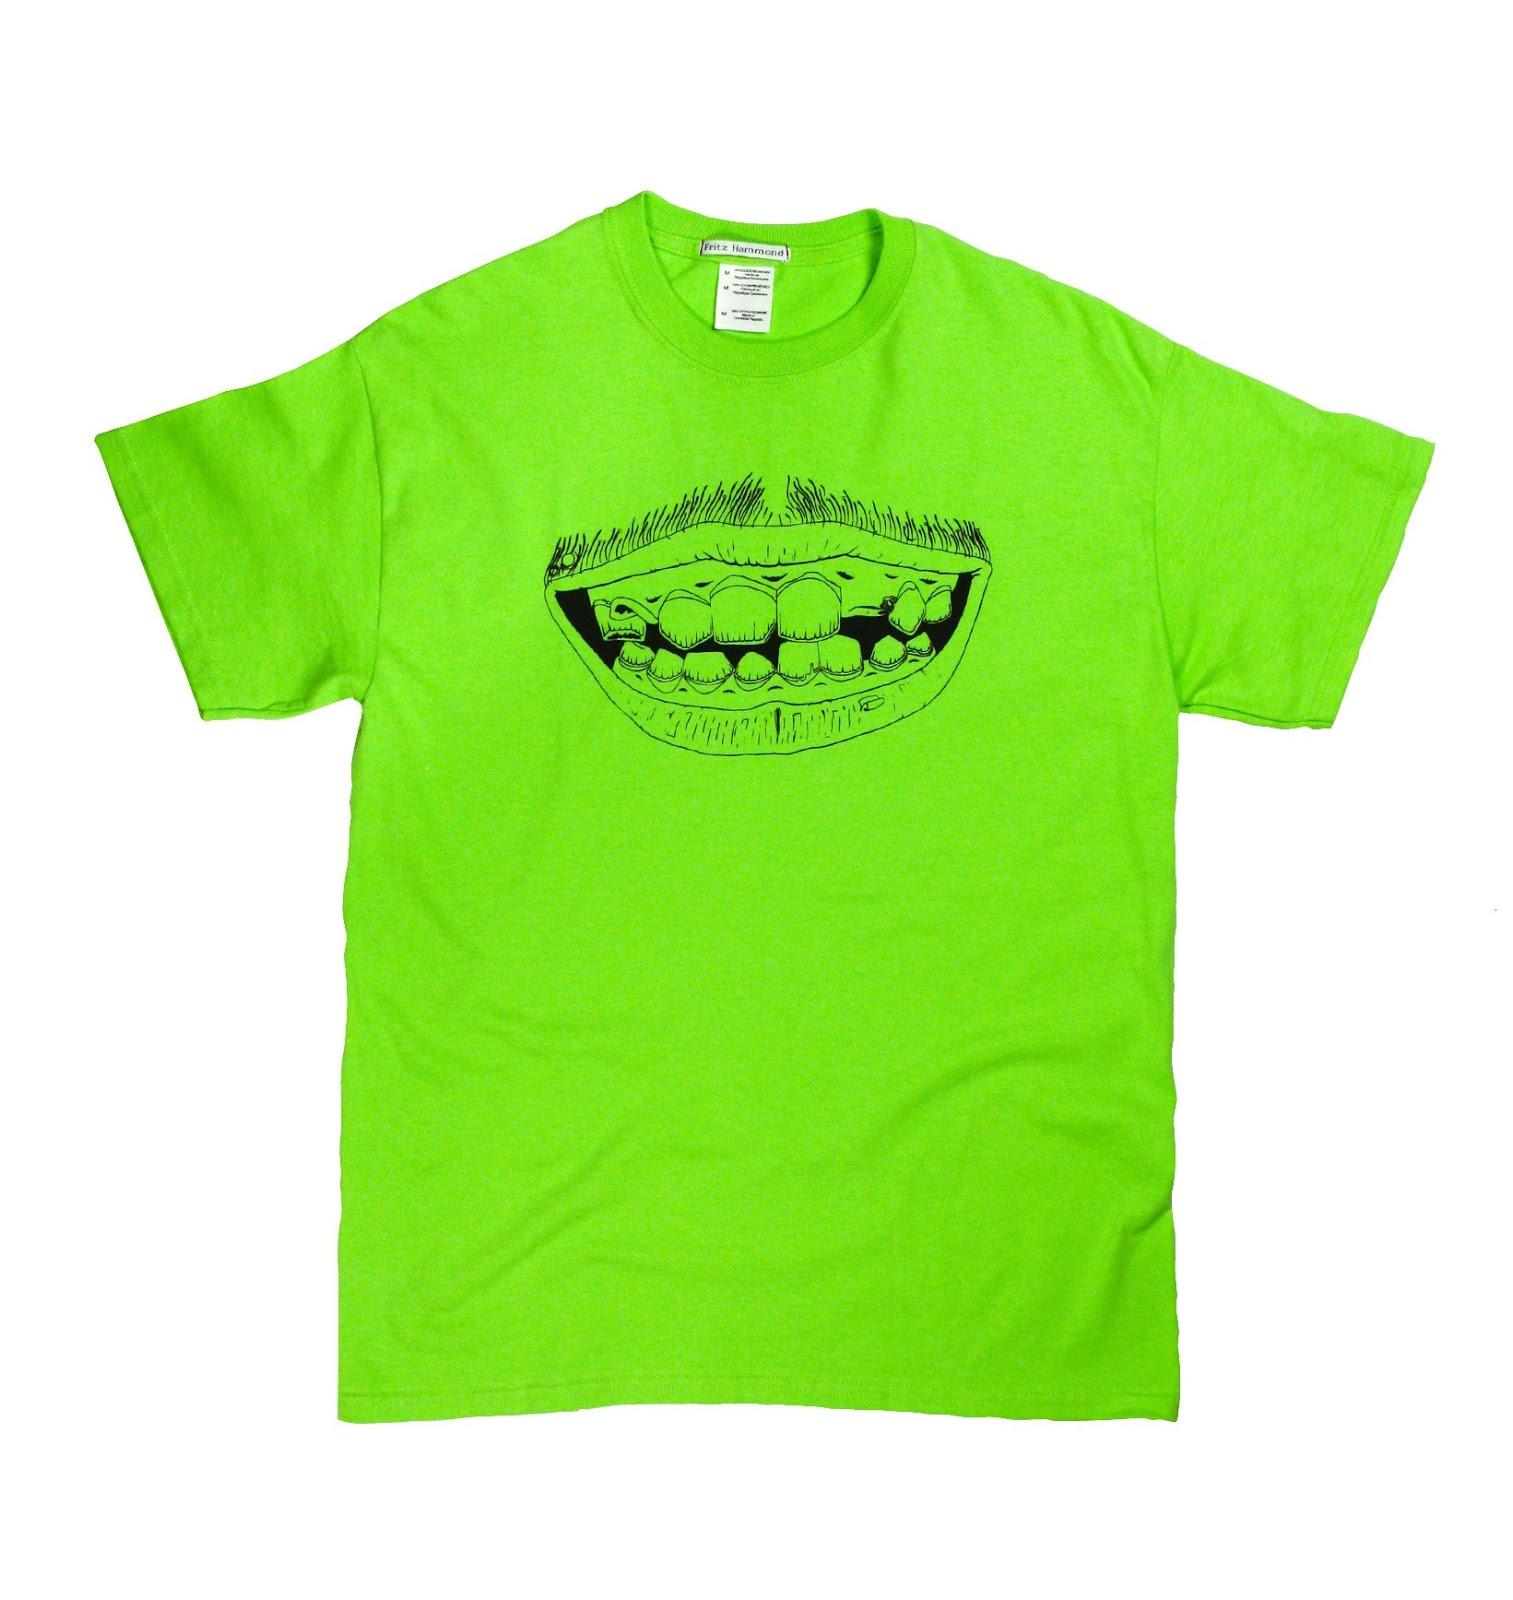 https://grafitee.es/s/camisetas/448-tshirt-happiness.html